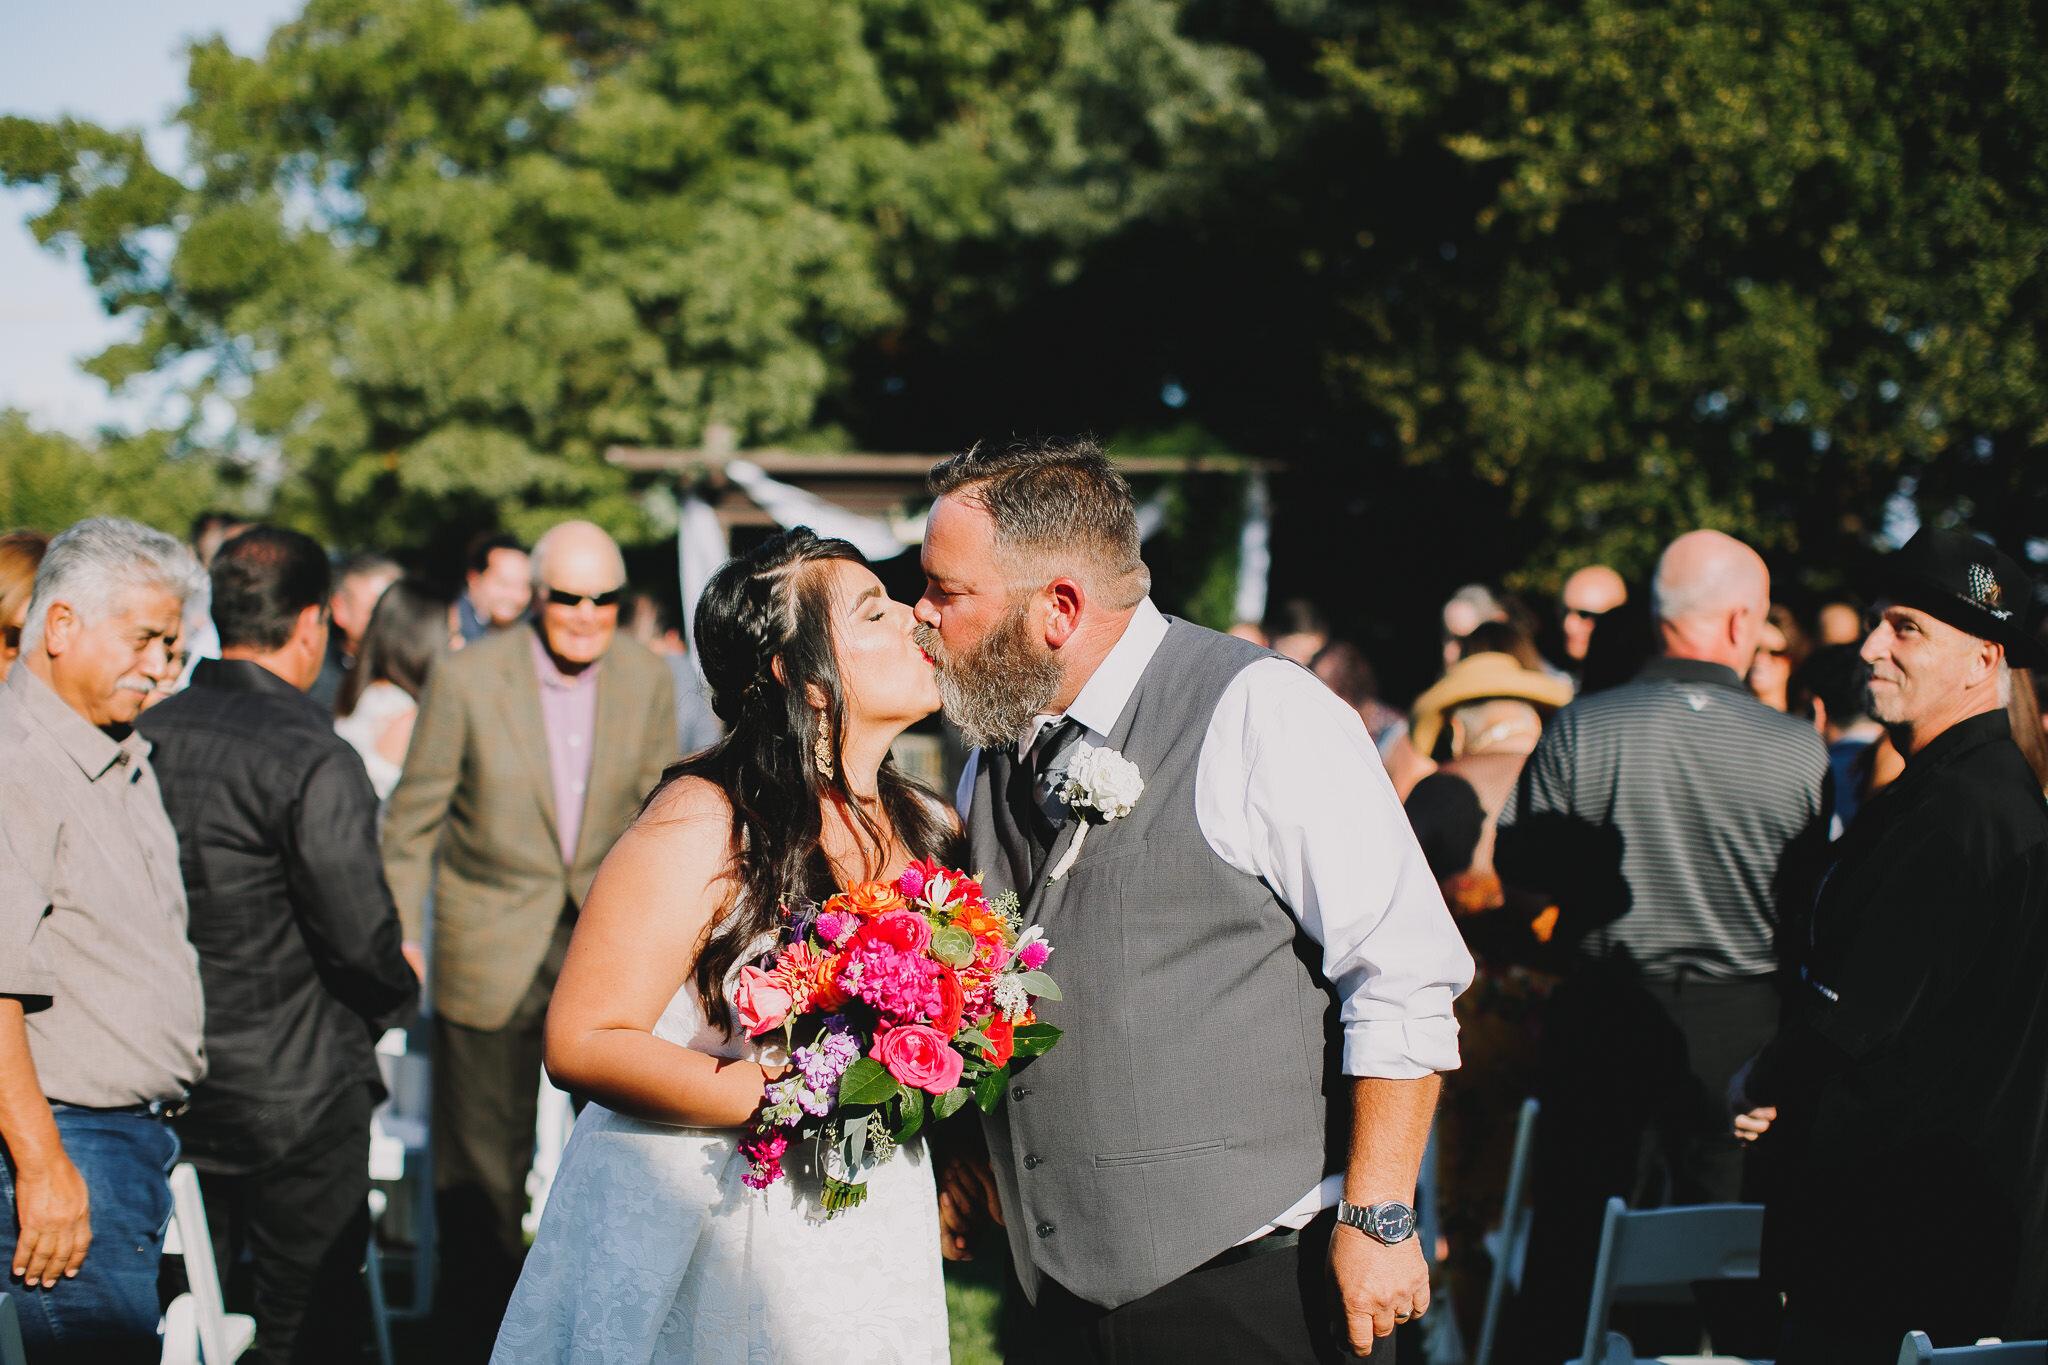 Archer Inspired Photography - Julia and Gary Wedding - San Martin CA Bay Area NorCal Wedding-20.jpg